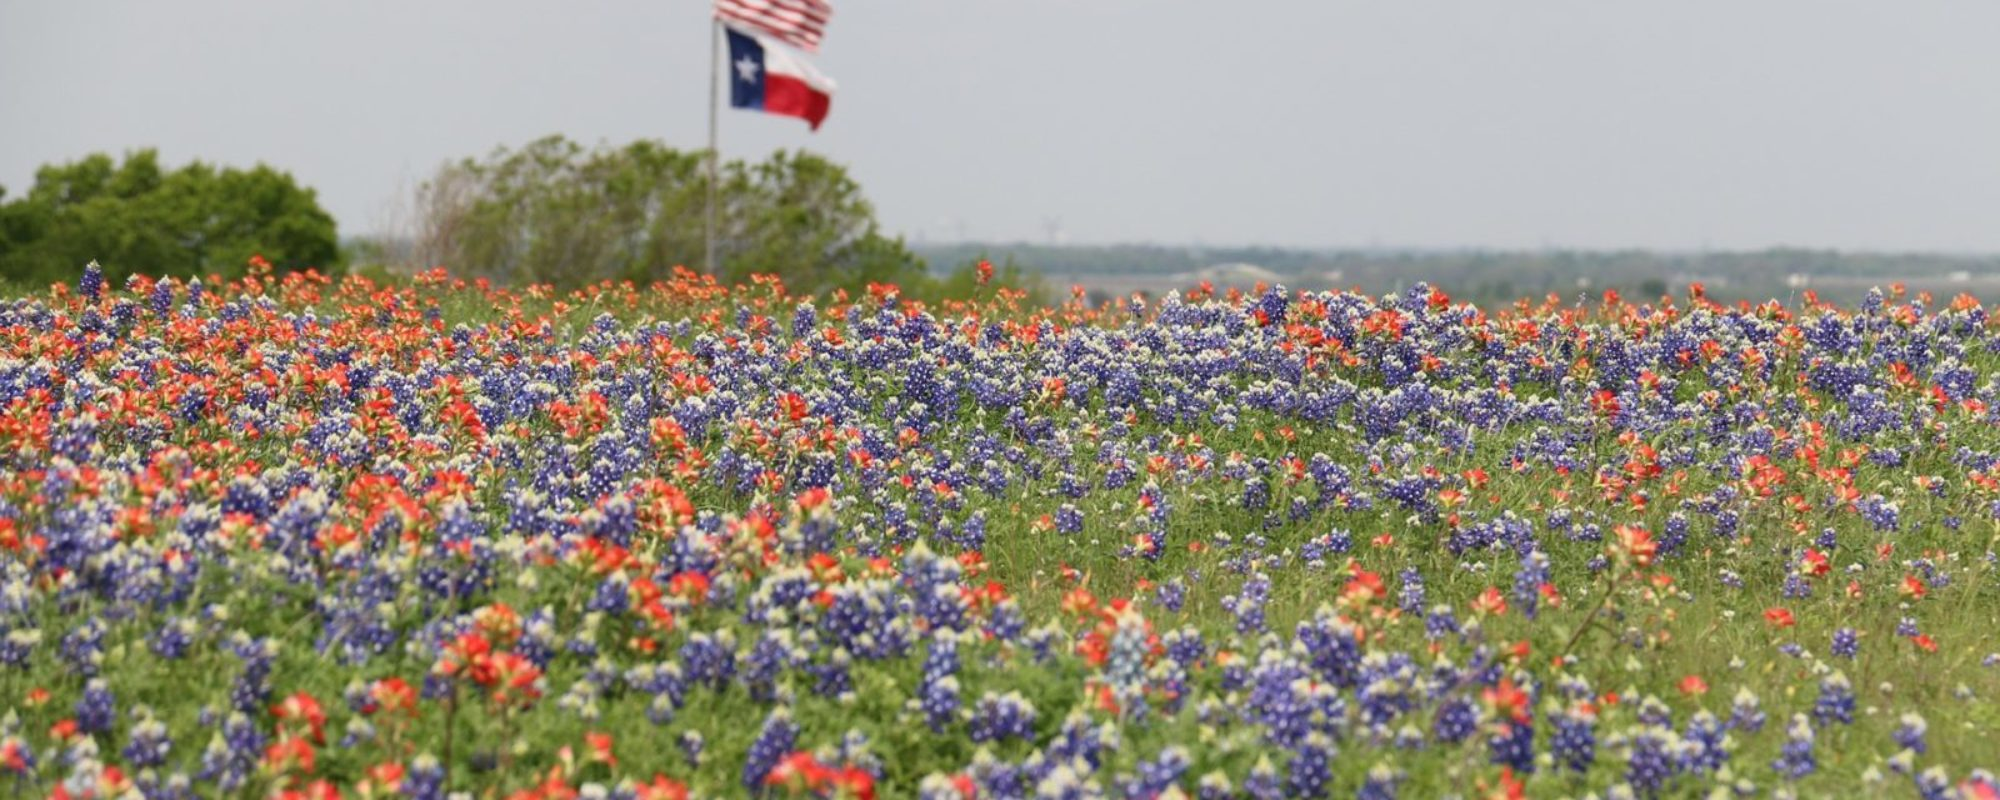 North Houston, TX